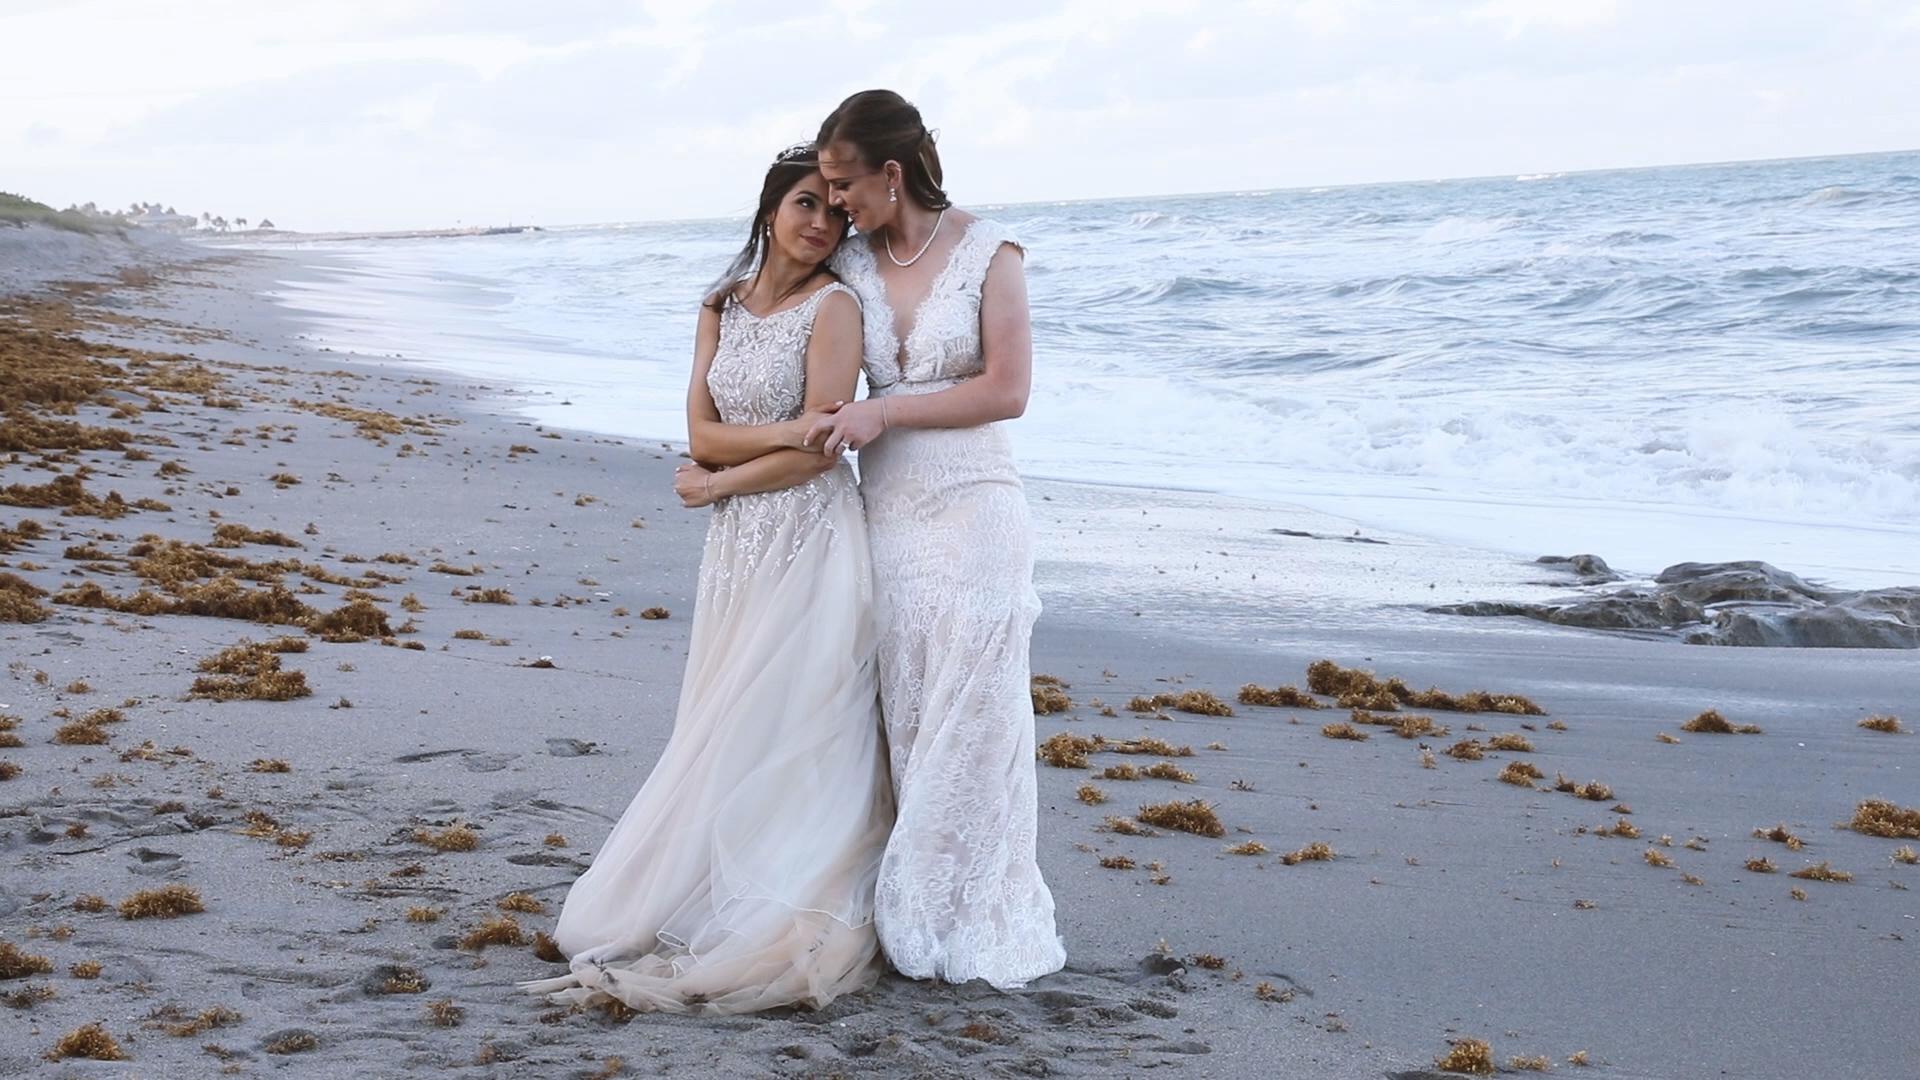 Bianca + Sarah | Jupiter, Florida | Jupiter Beach Resort & Spa